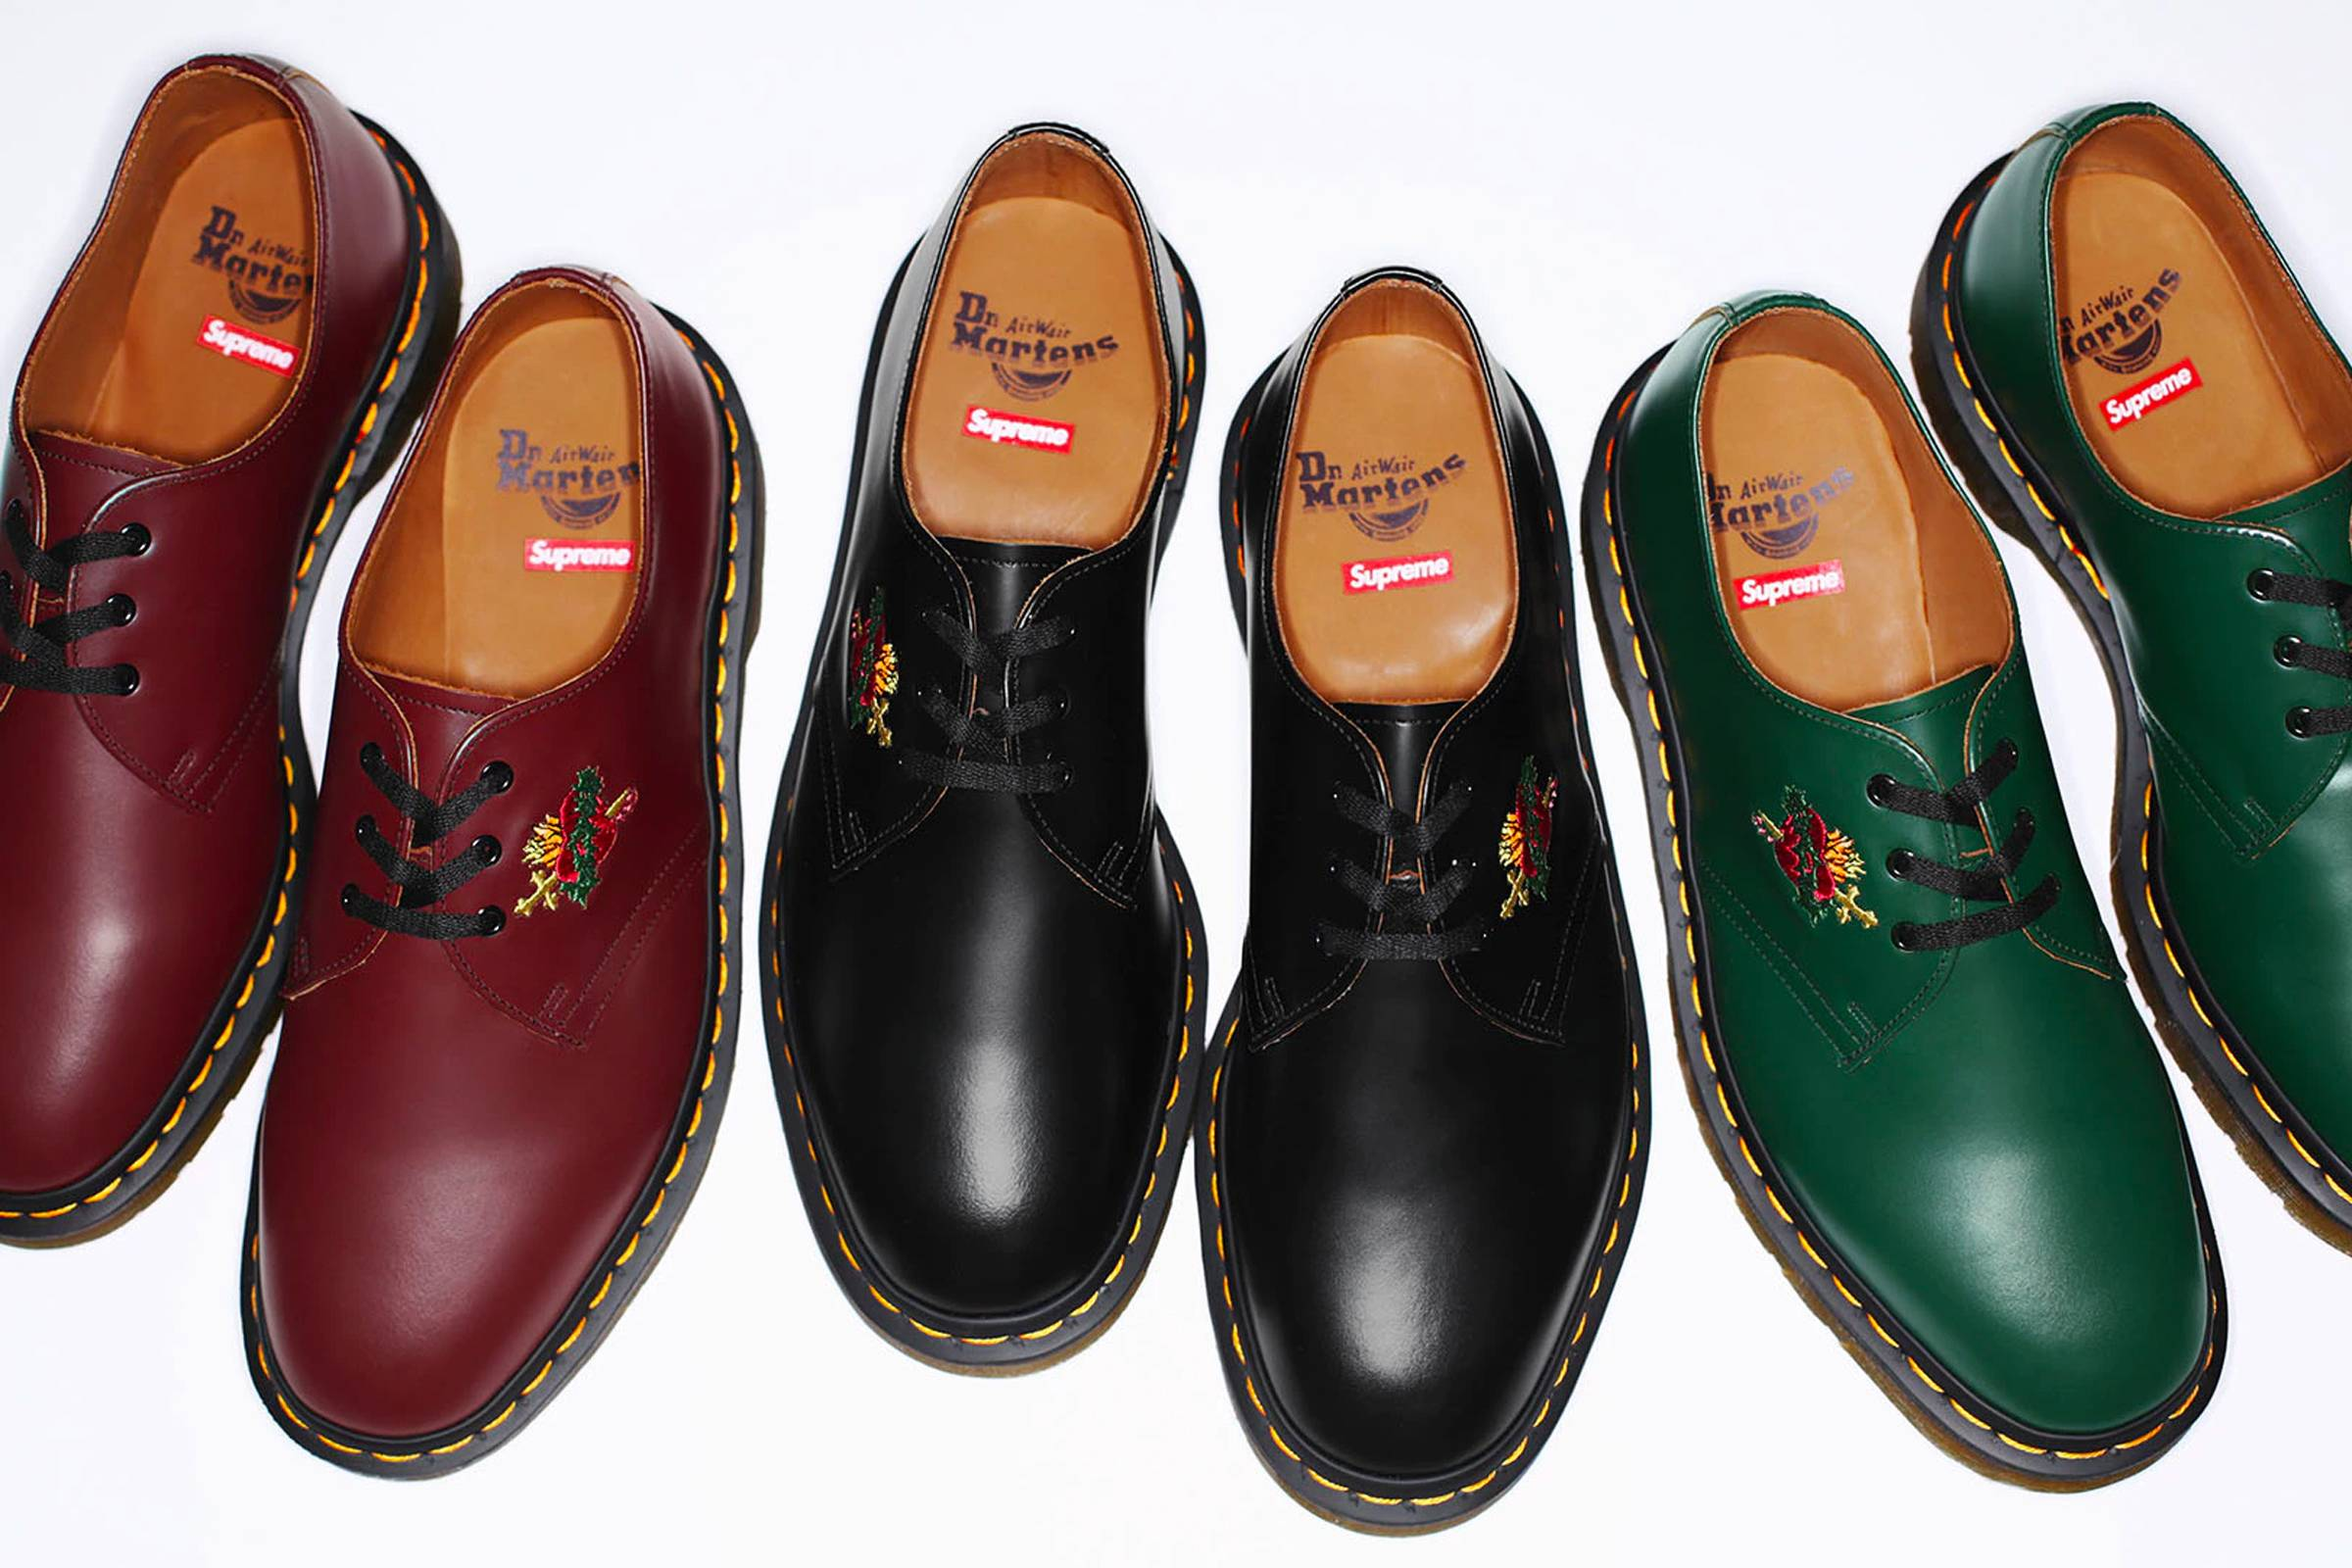 Низкие ботинки Supreme x Dr. Martens «Sacred Heart» 1461